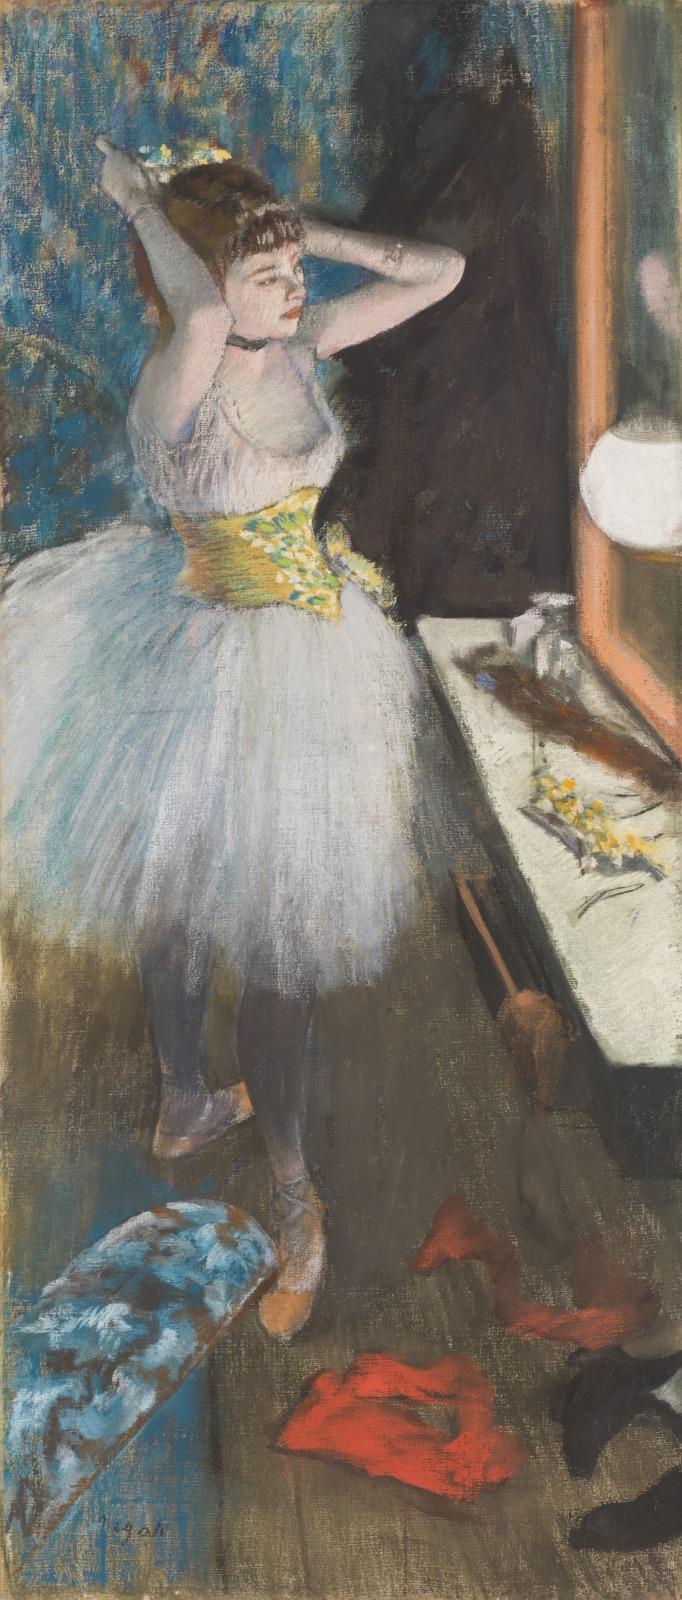 Dancer in Her Dressing Room (Danseuse dans sa loge)